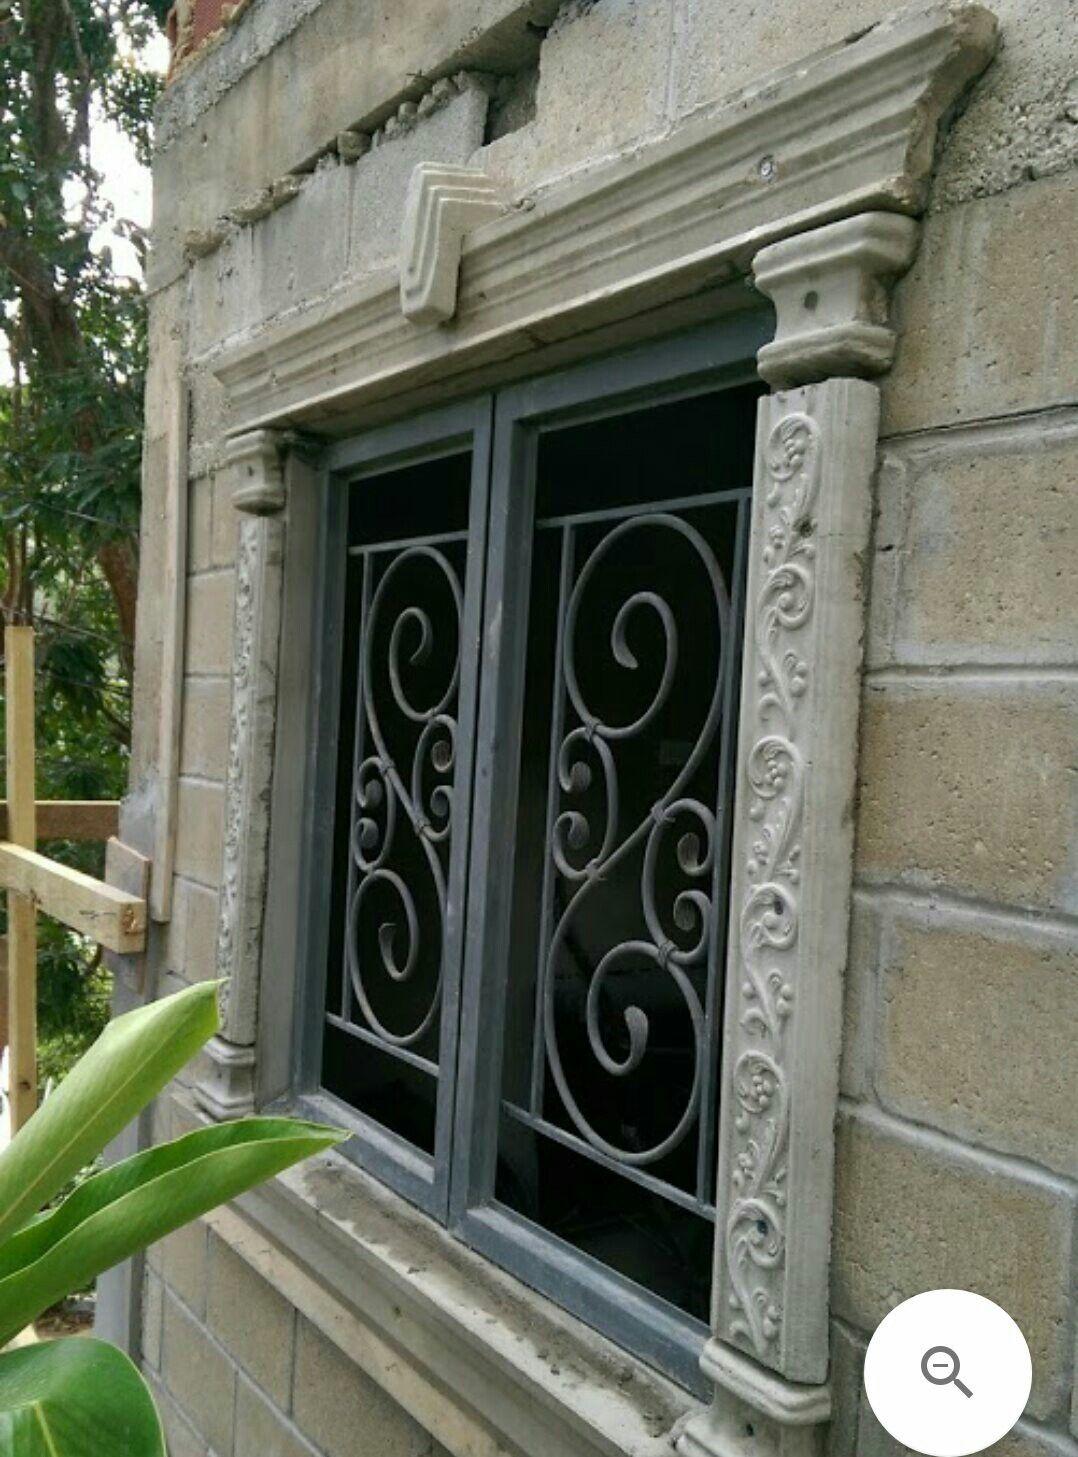 Zinc Metal Windows Wrought Iron Burglar Proofing Facade House Bay Window Window Design